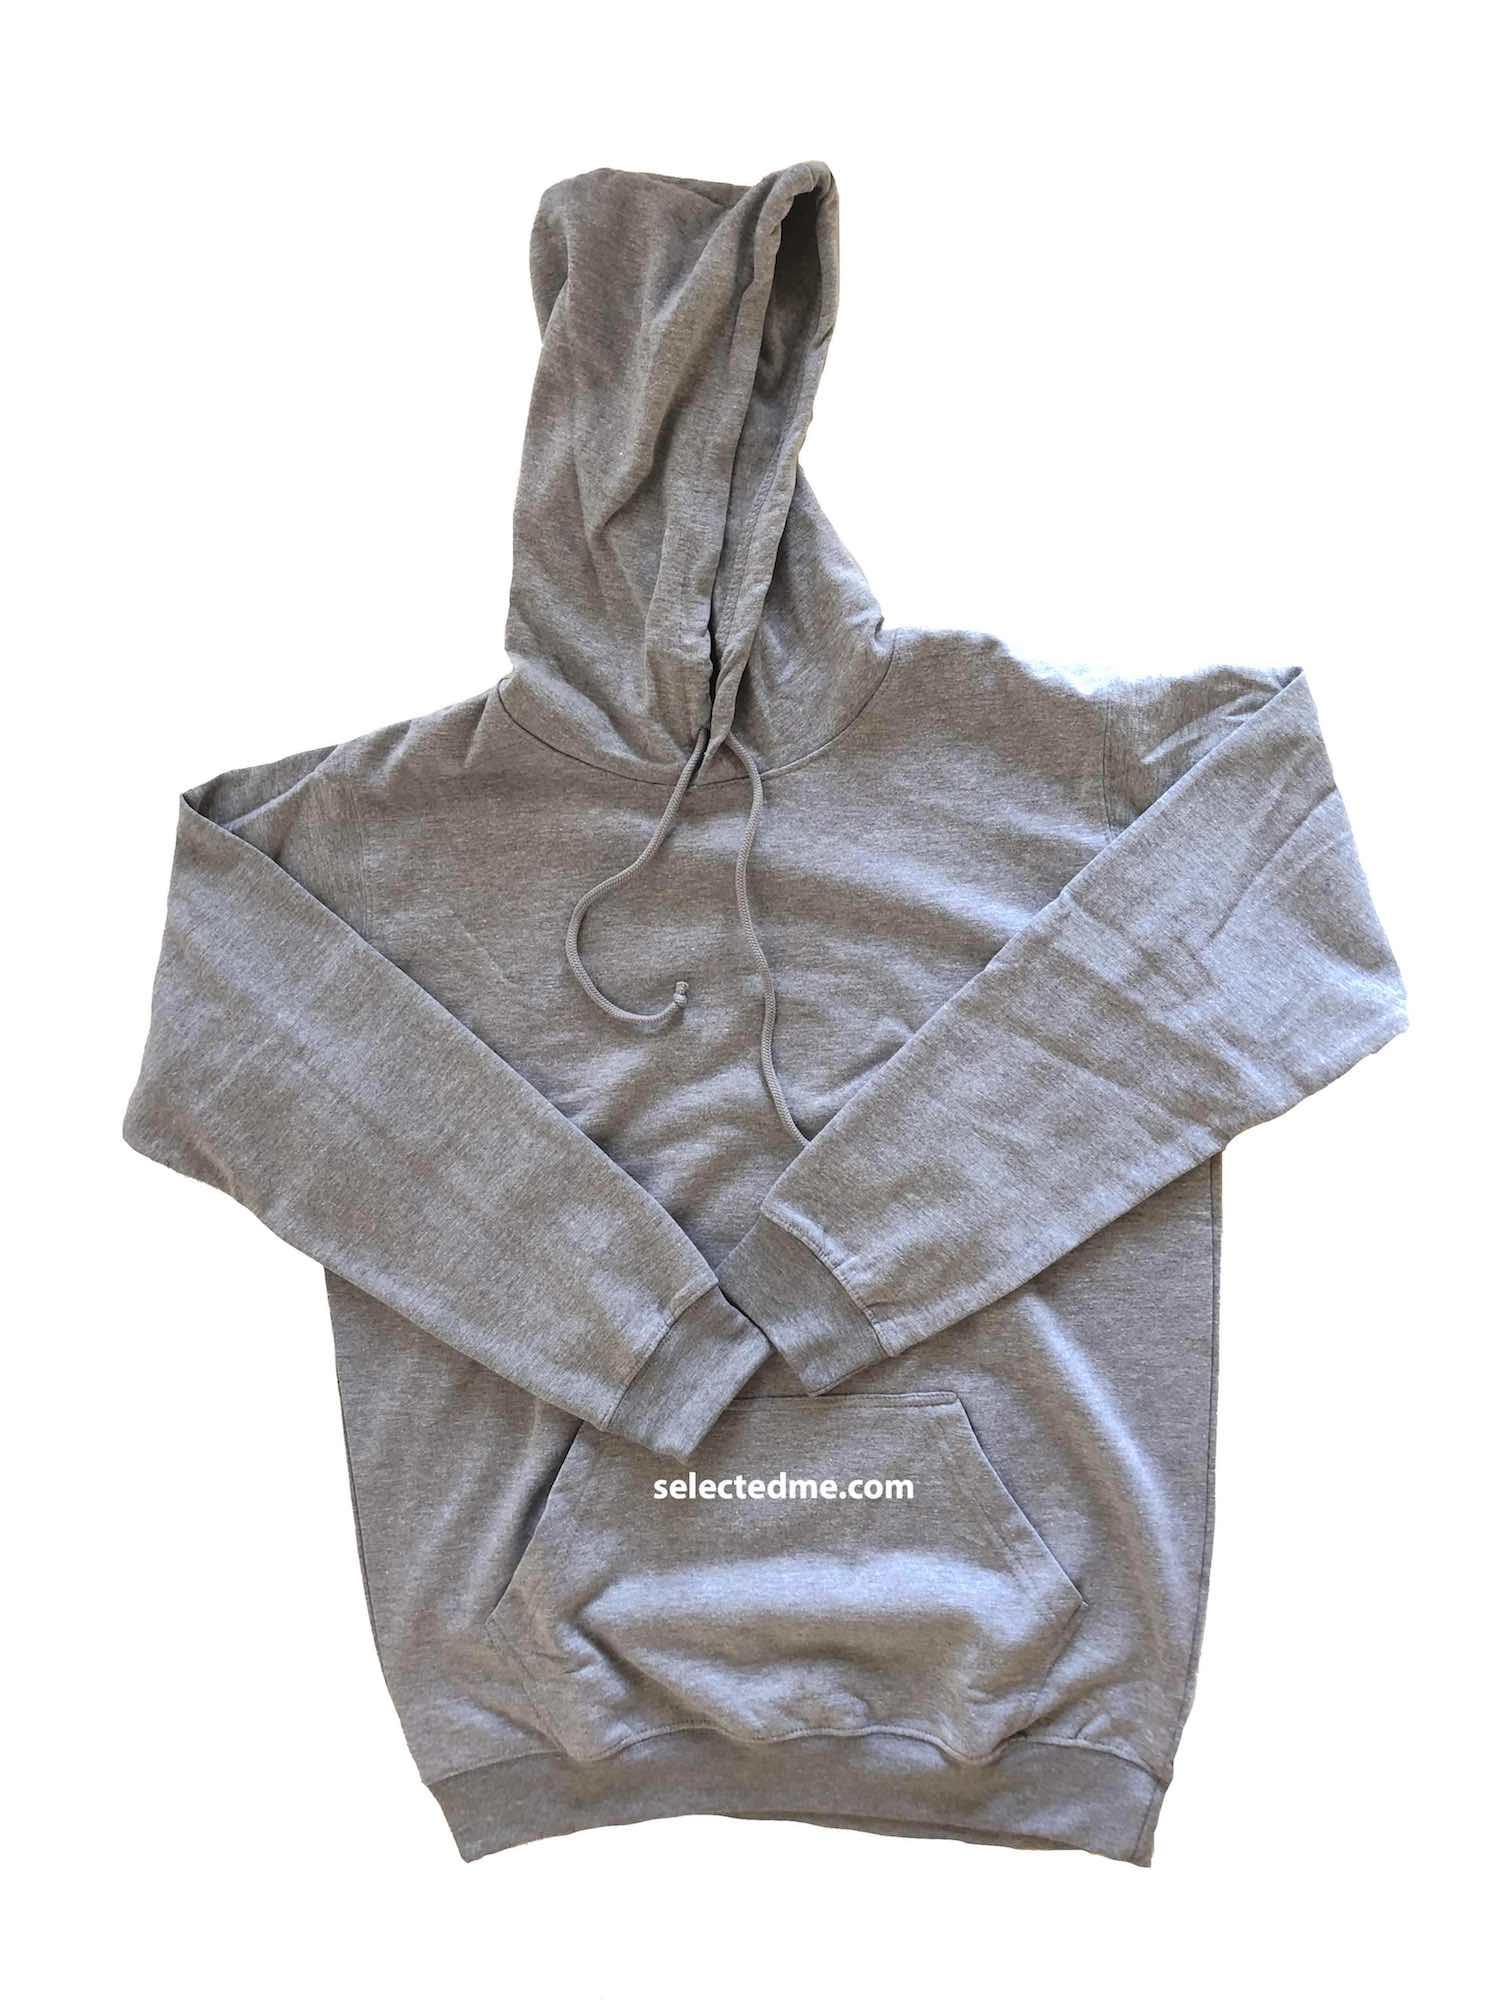 Grey Fleece Jacket - Hoodie Red Fleece Jackets